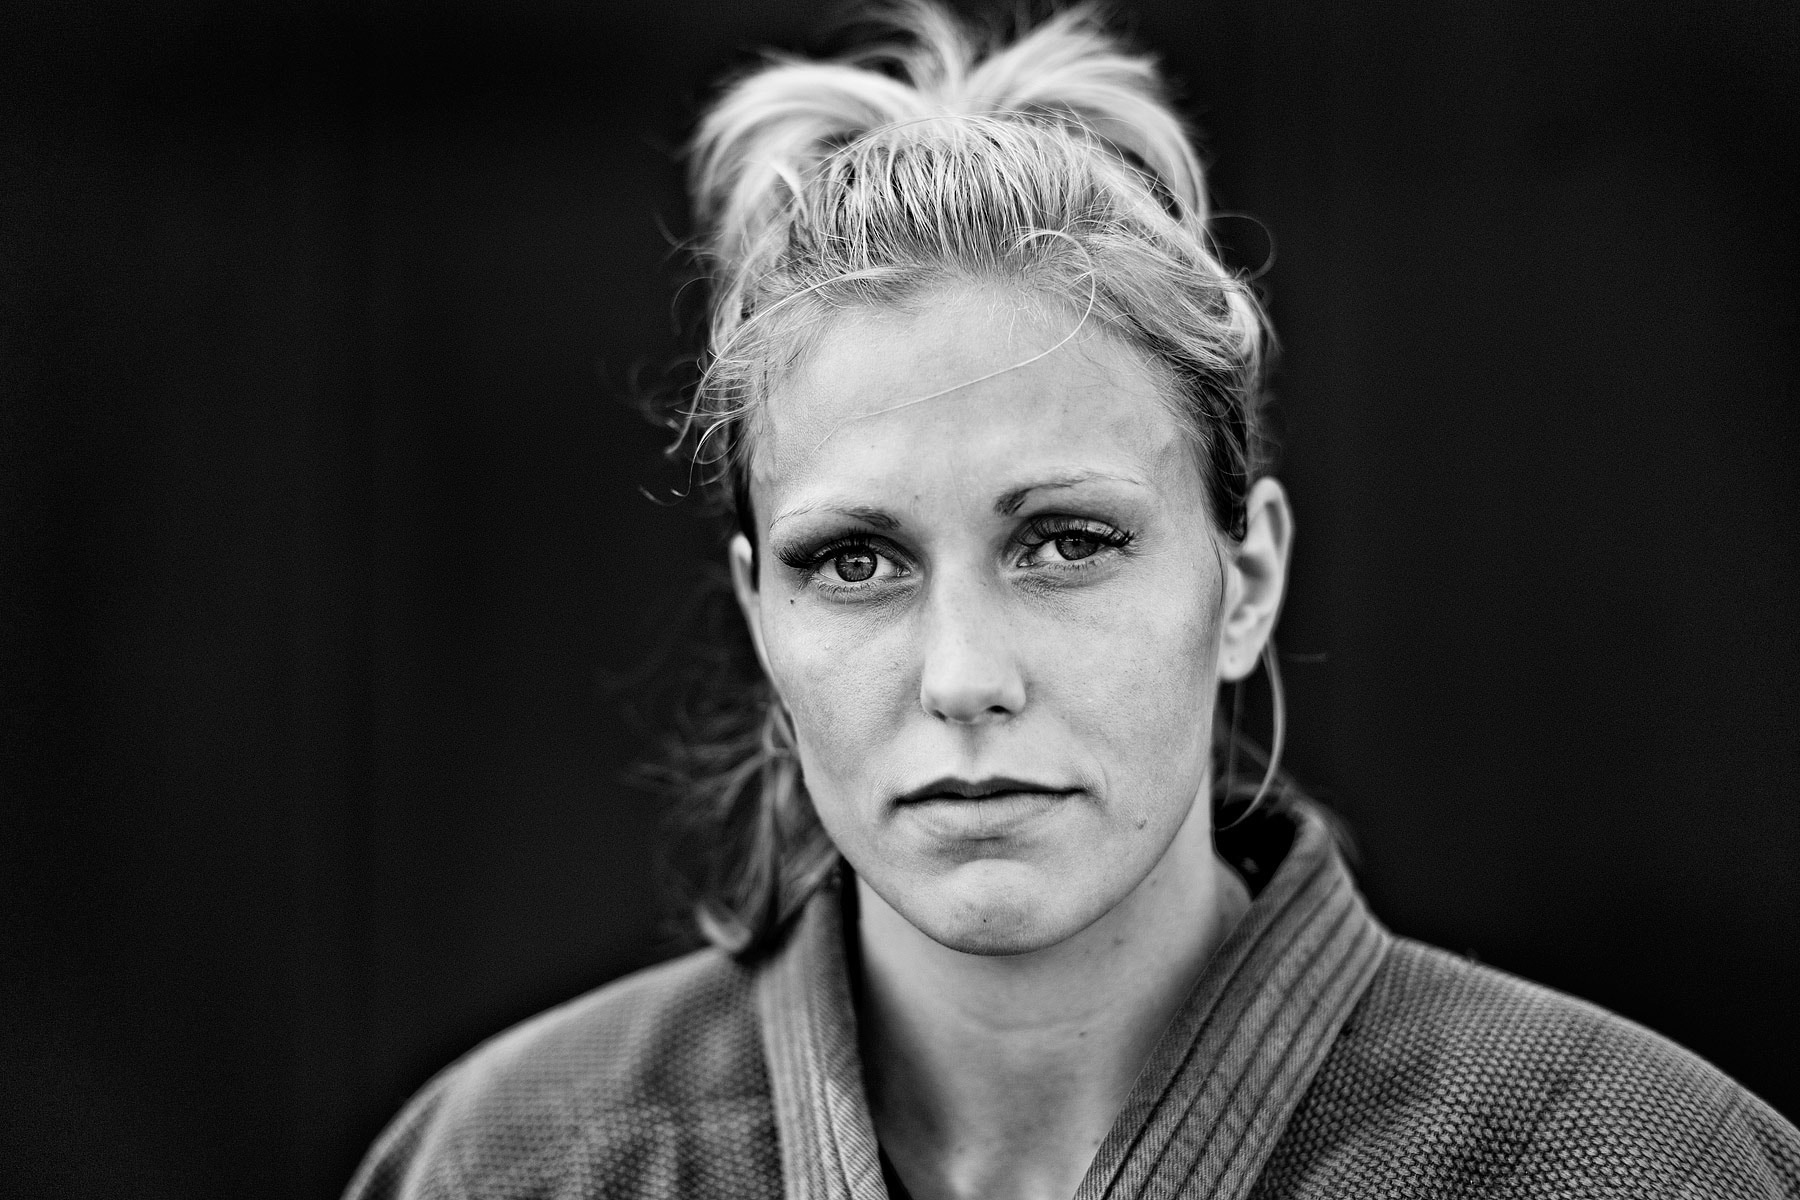 Gemma Gibbons, London 2012 Olympic silver medalist.British Judo Team GB 2012